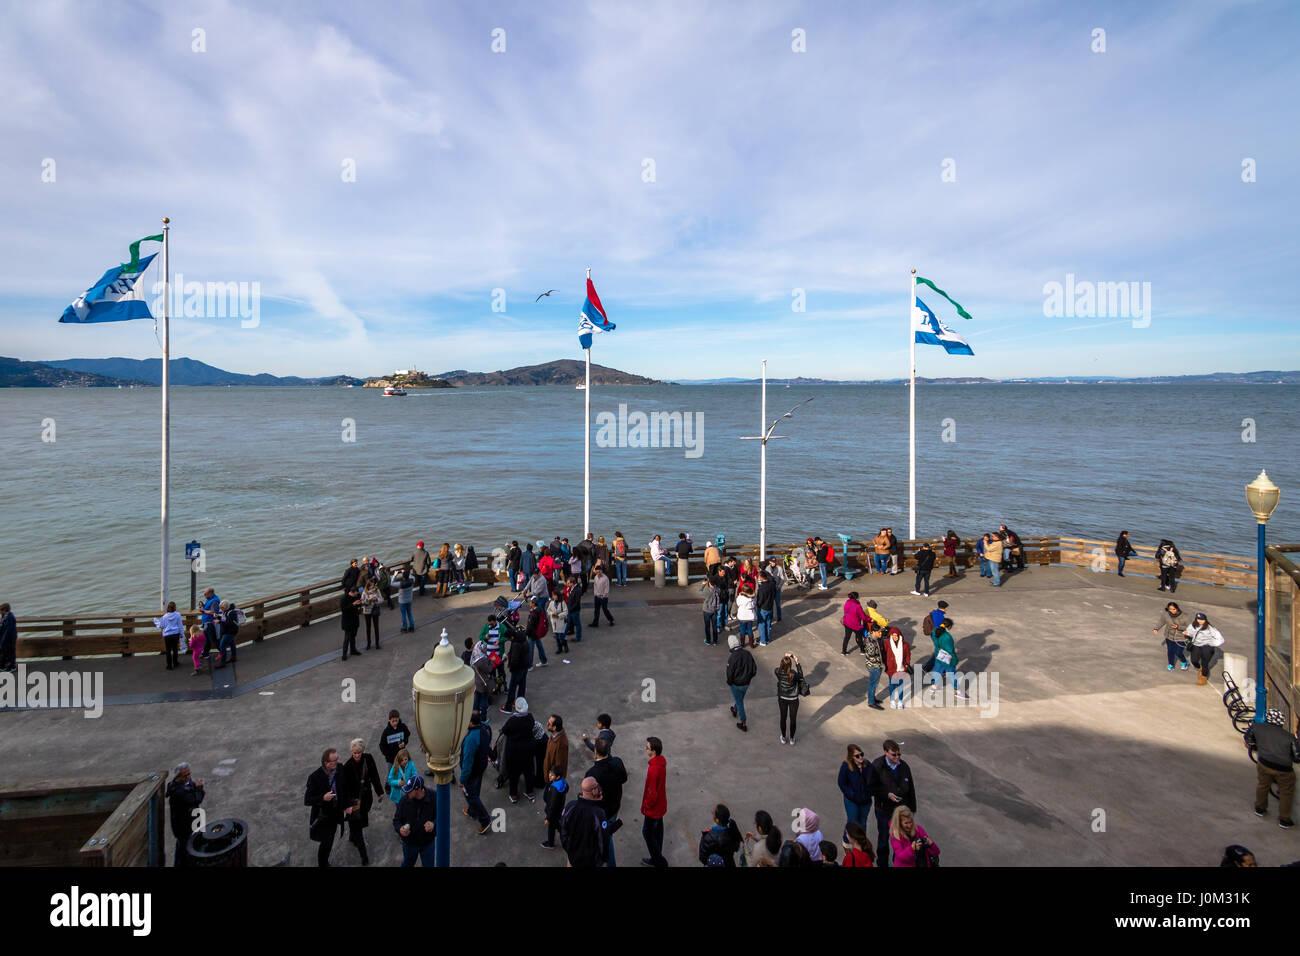 View of Alcatraz Island from Pier 39 in Fishermans Wharf - San Francisco, California, USA - Stock Image